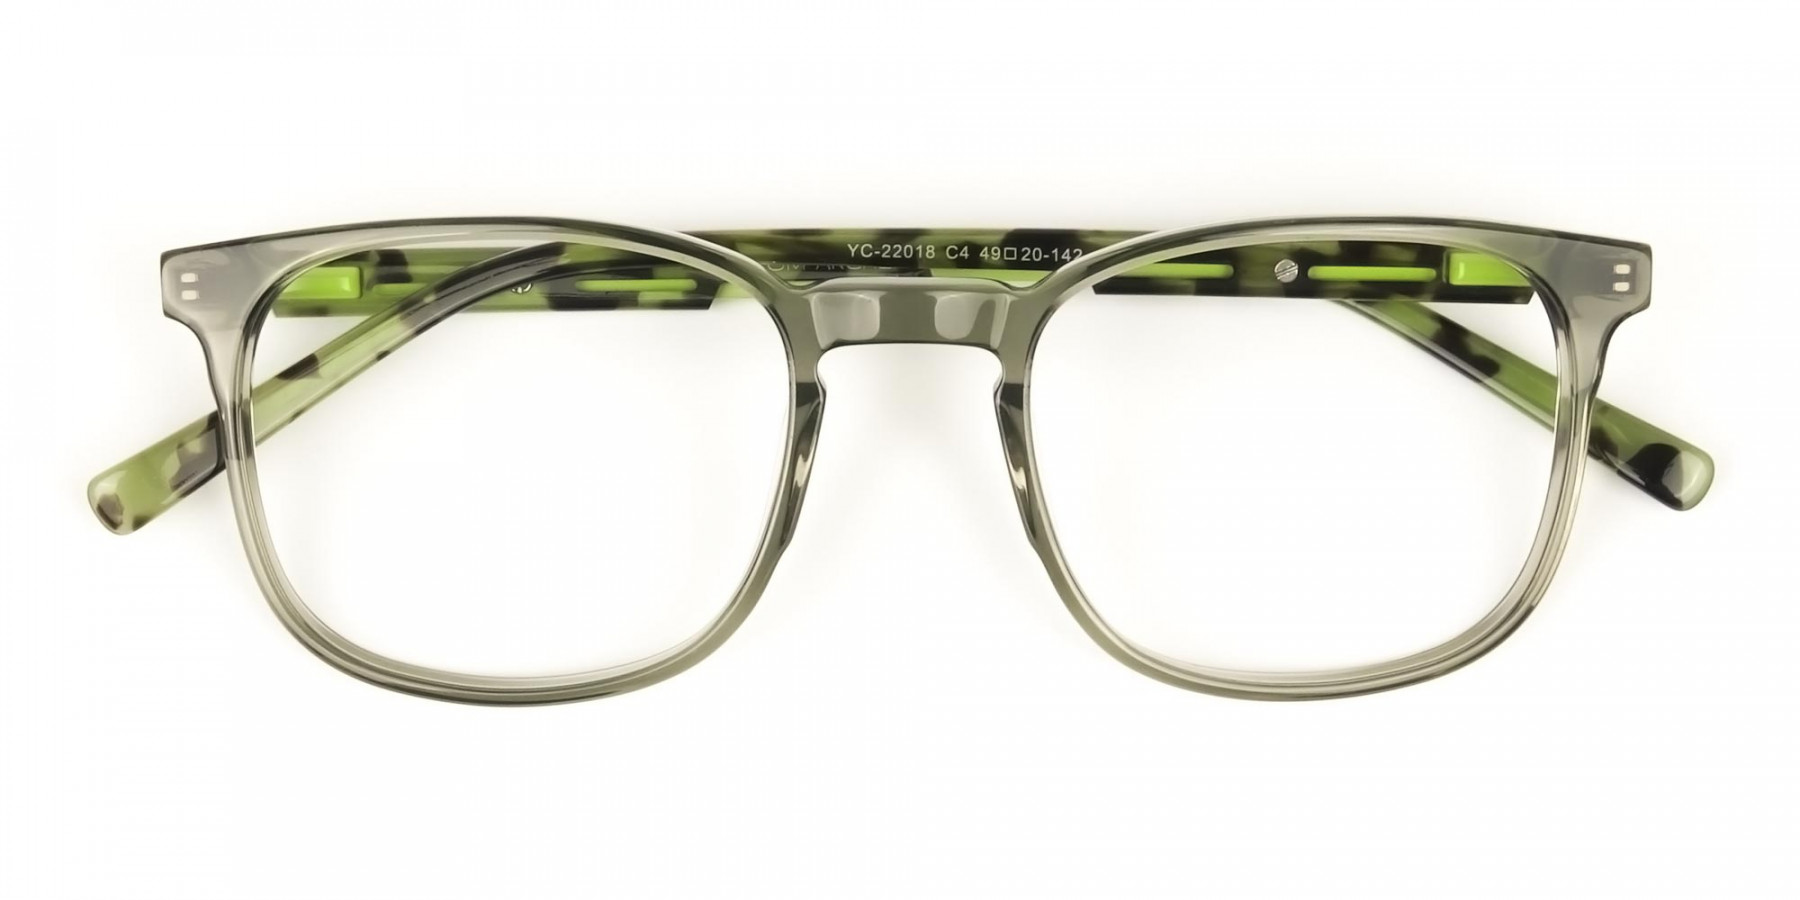 Translucent Camouflage & Olive Green Square Glasses - 1